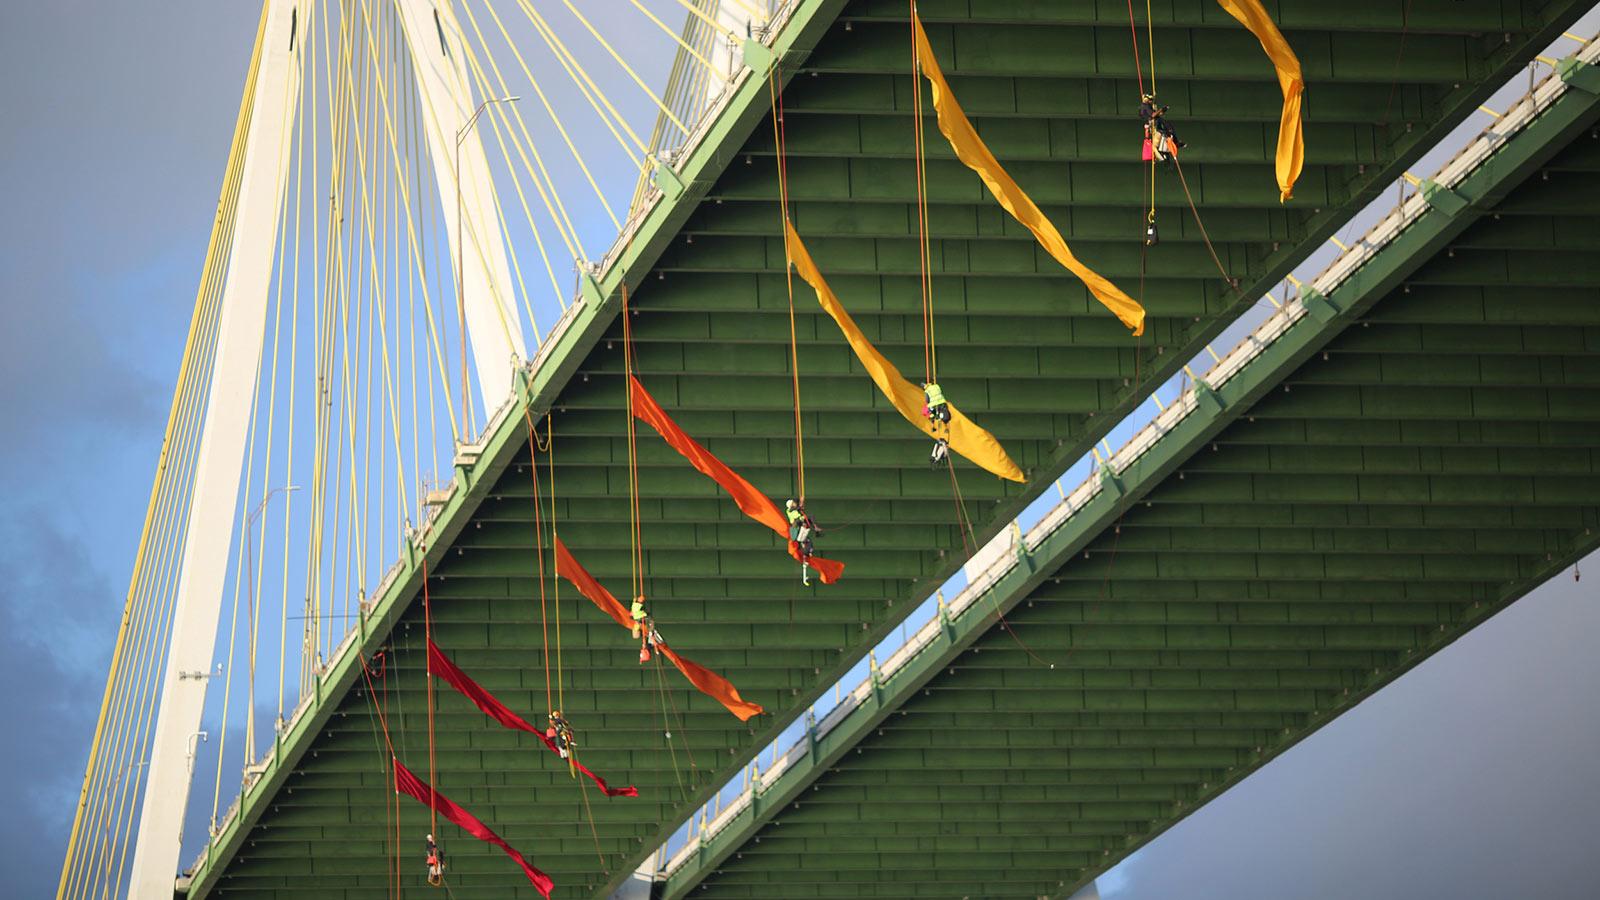 Greenpeace USA climbers form a blockade on the Fred Hartman Bridge in Baytown, Texas